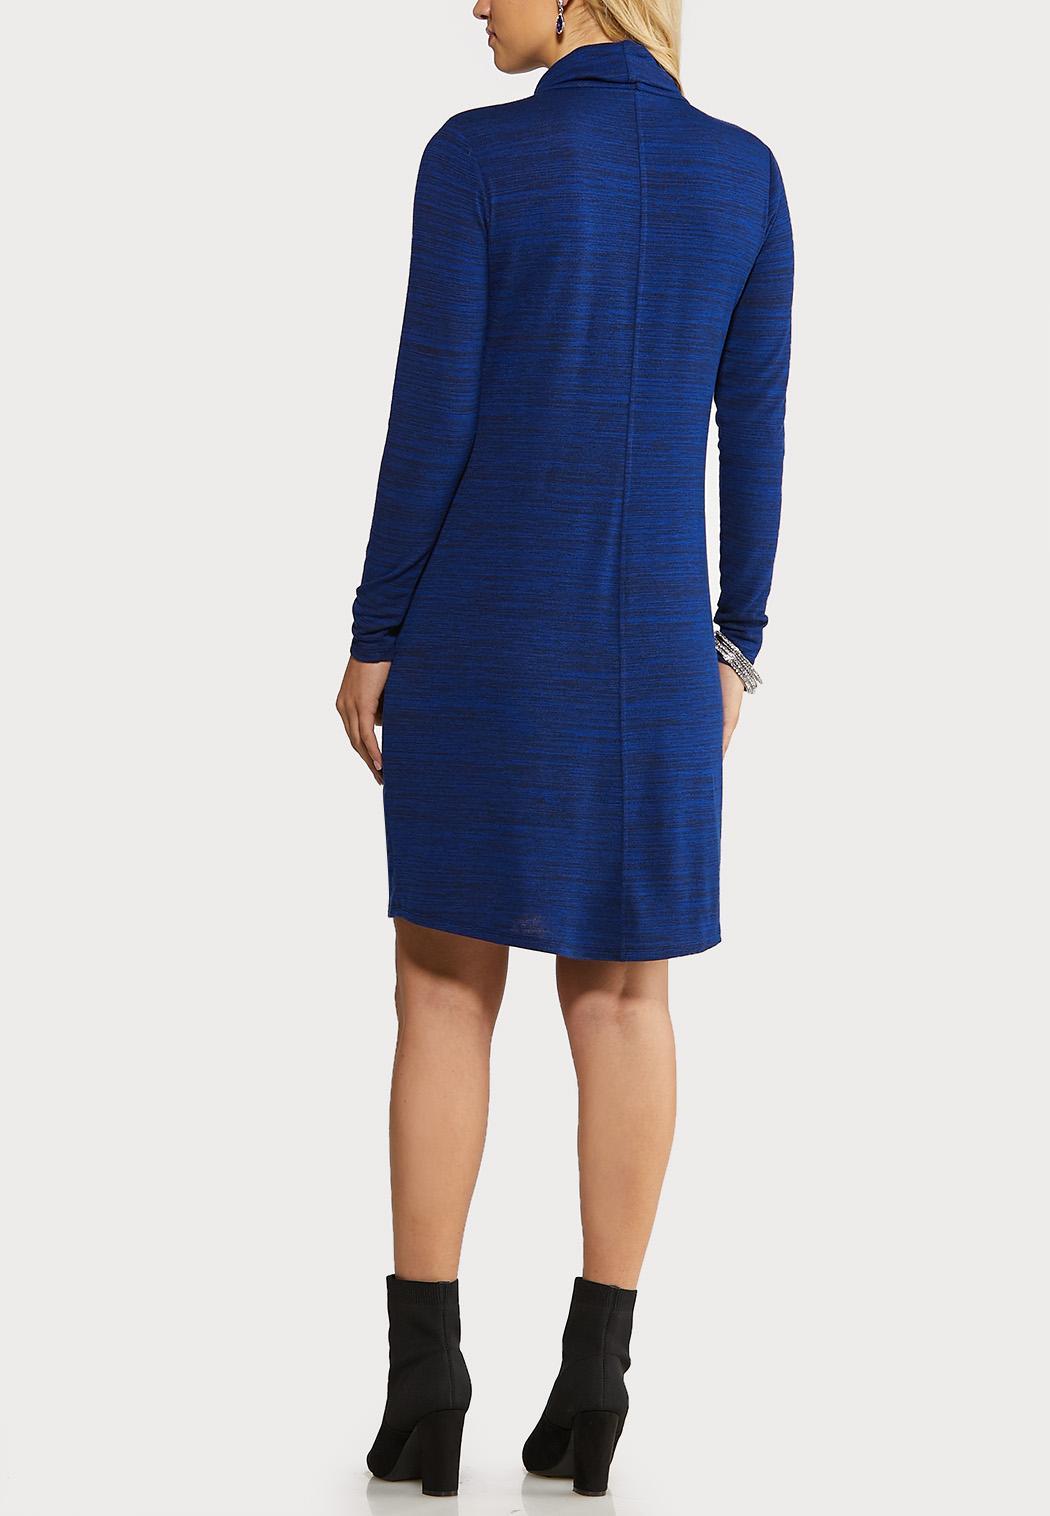 Blue Hacci Swing Dress (Item #44077400)